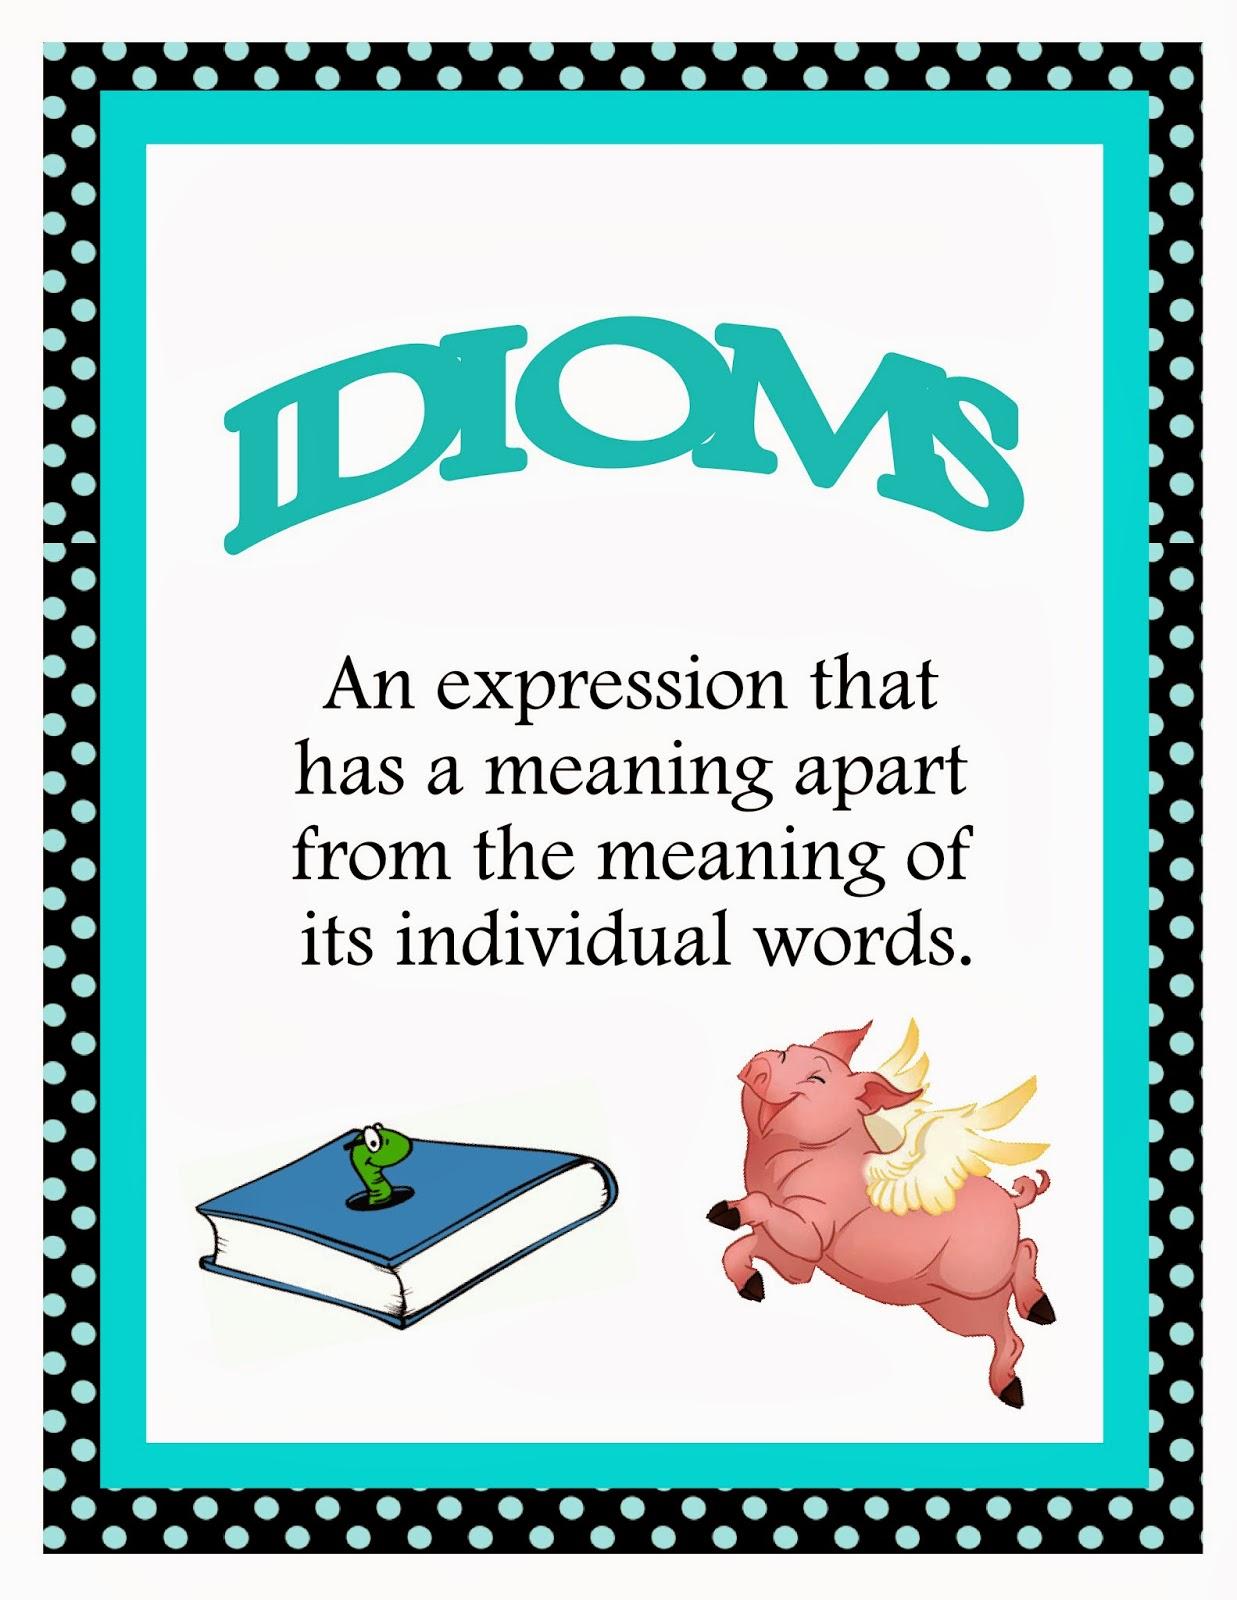 http://www.teacherspayteachers.com/Product/Idioms-Idioms-Idioms-334502